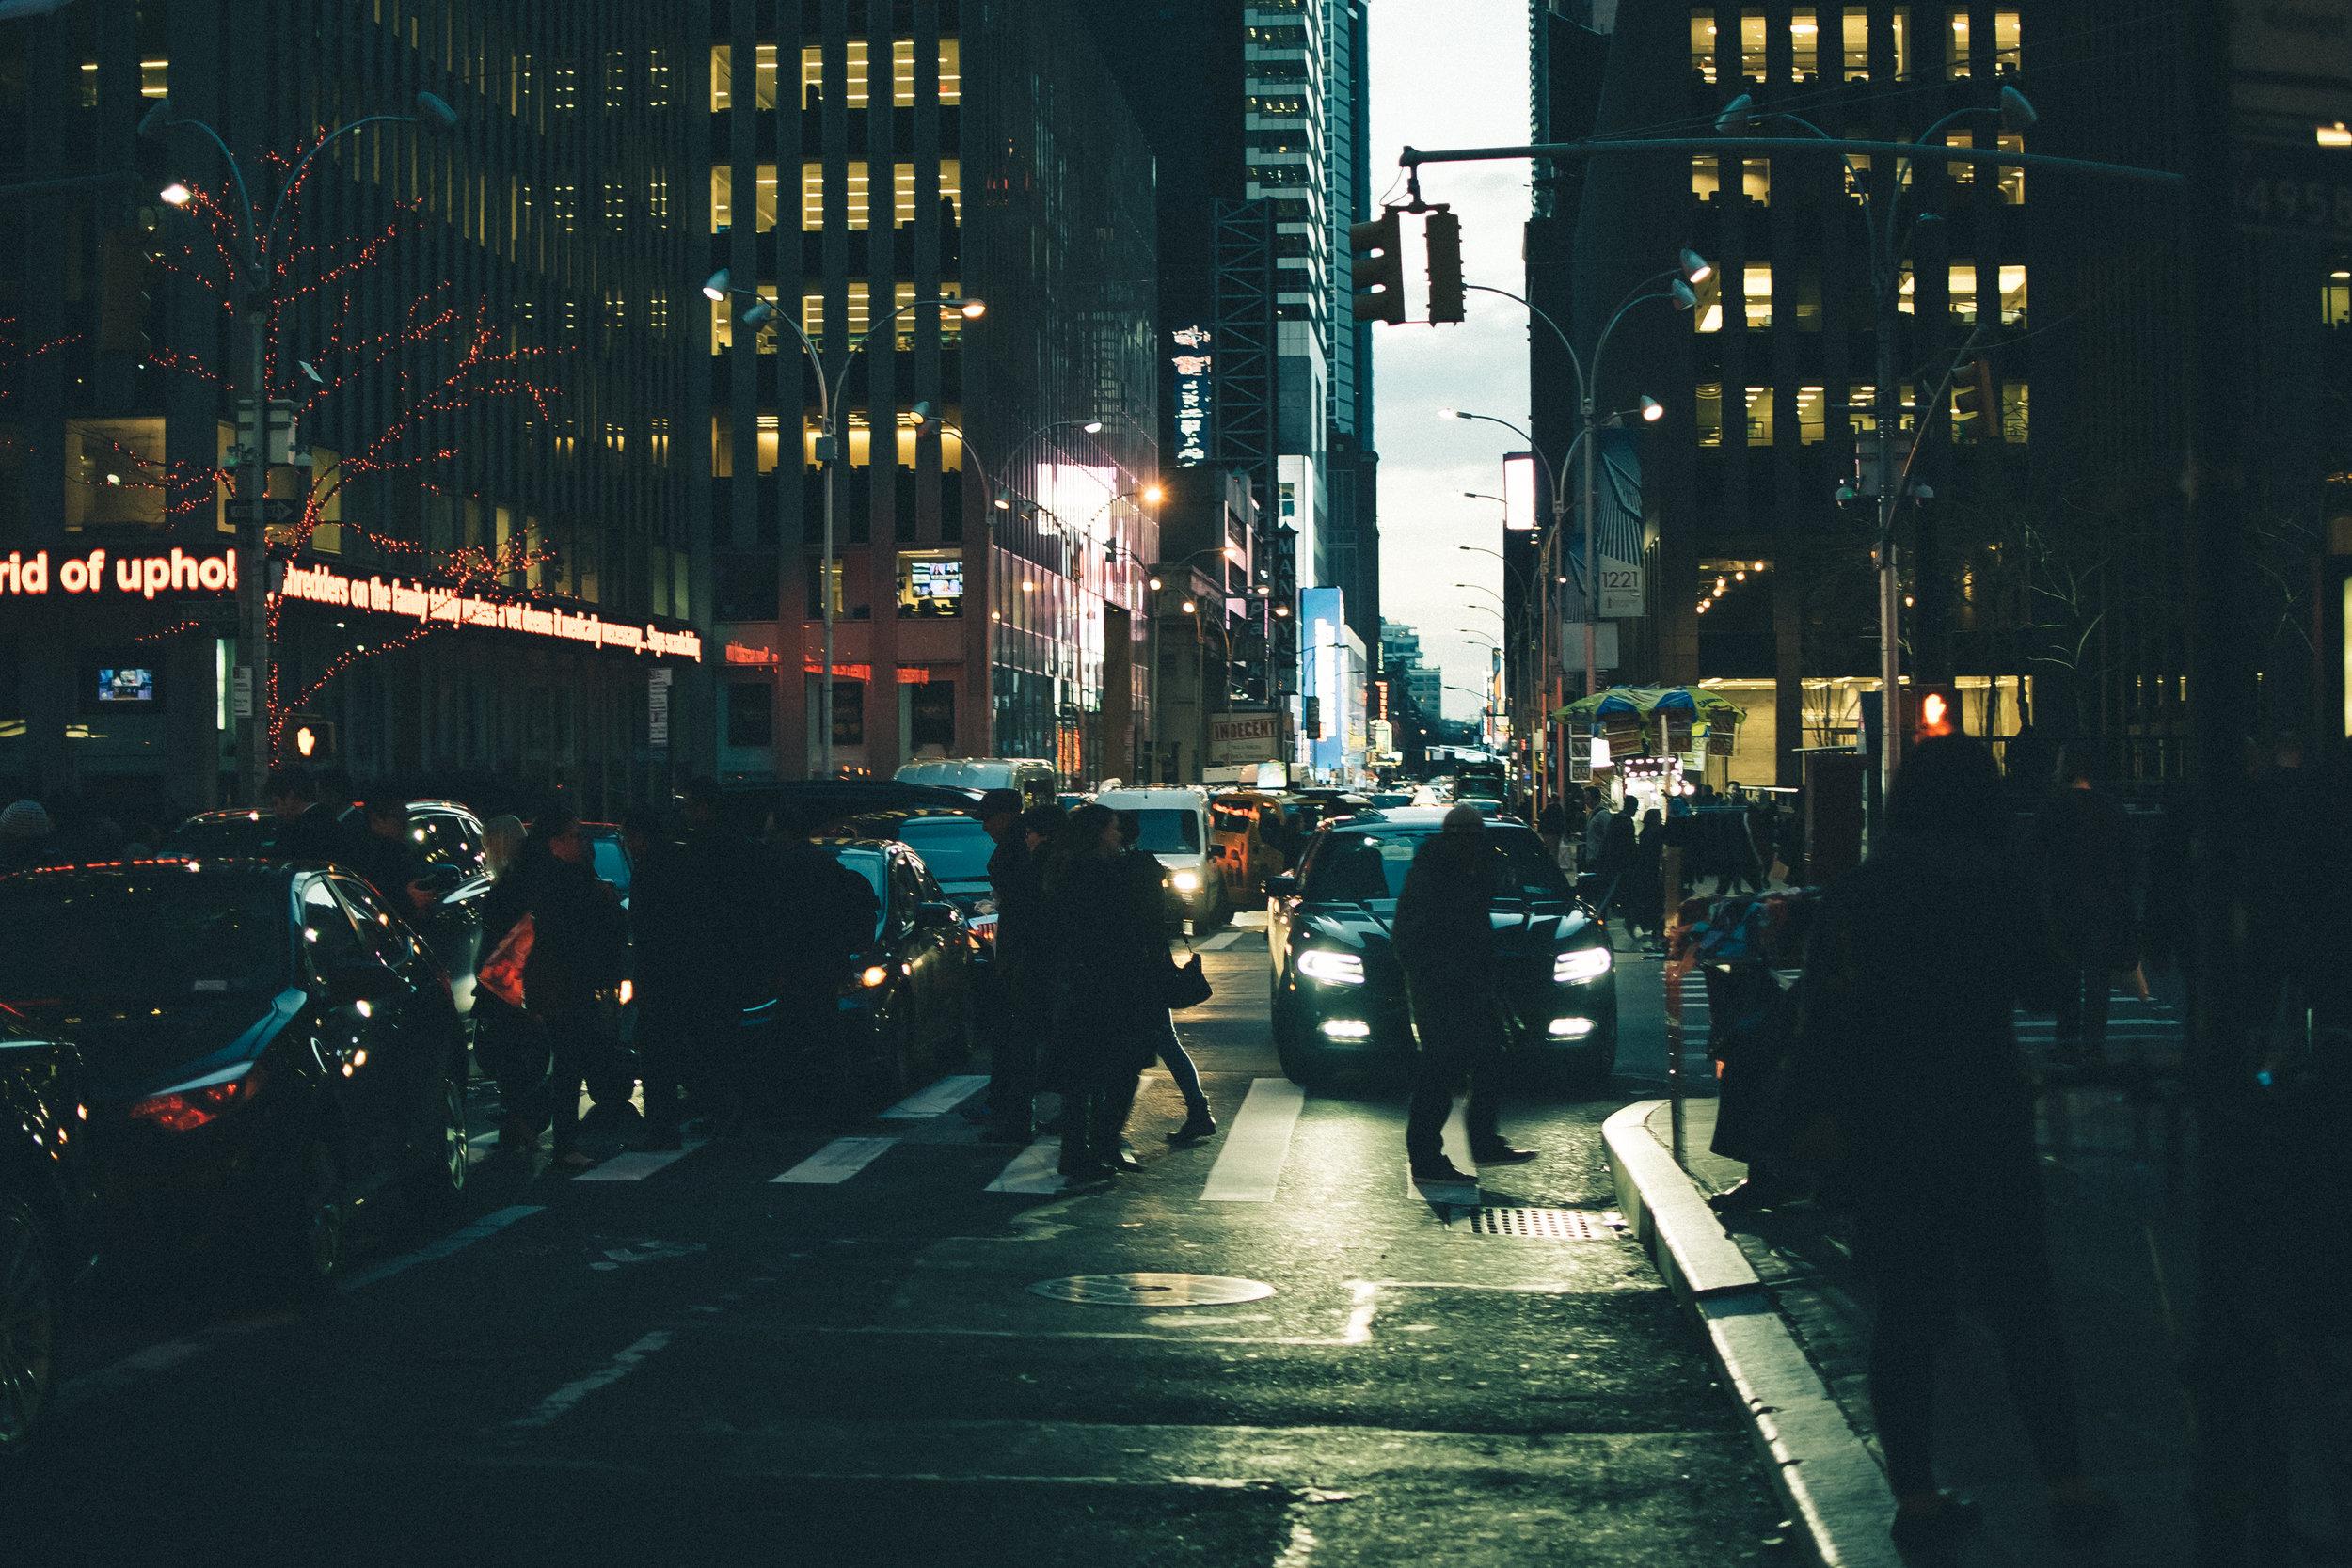 Kyle Studstill_Composure_New York City-2-2.jpg